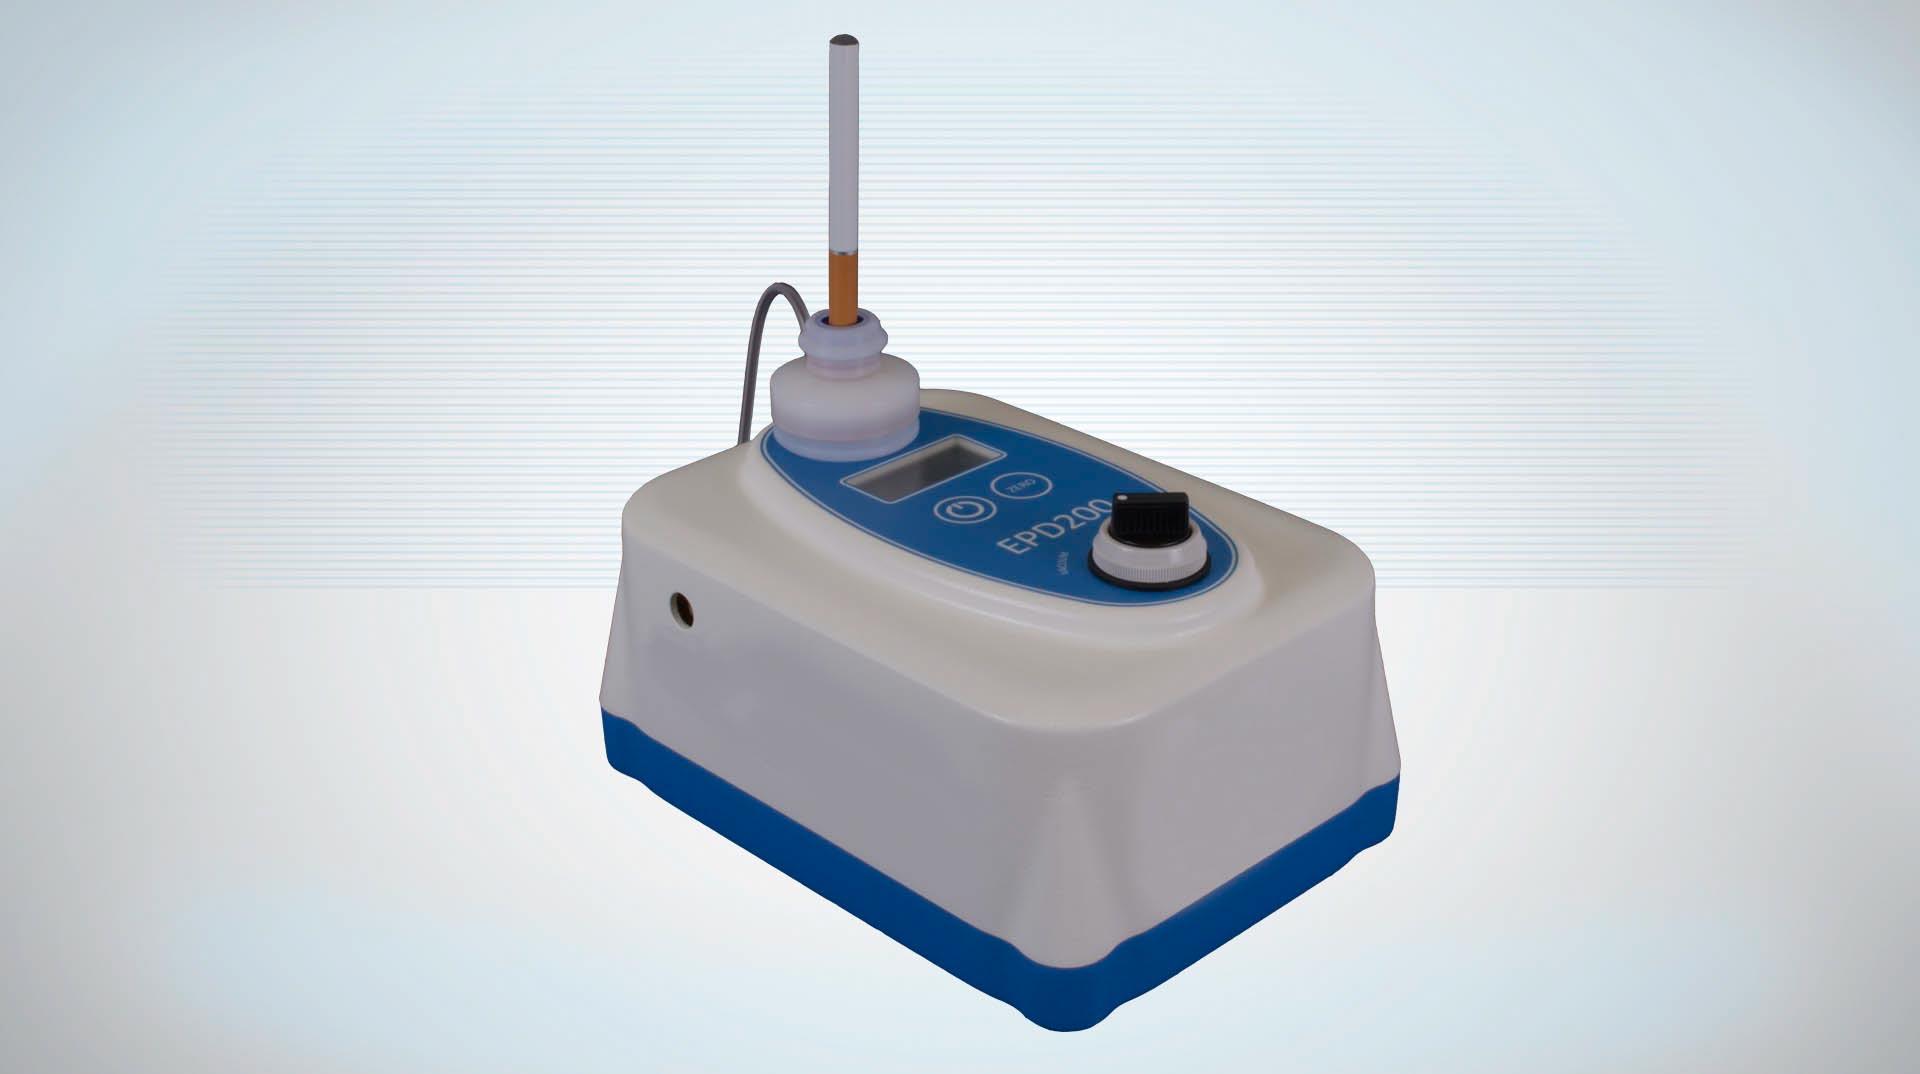 EPD200 - E-cig testing